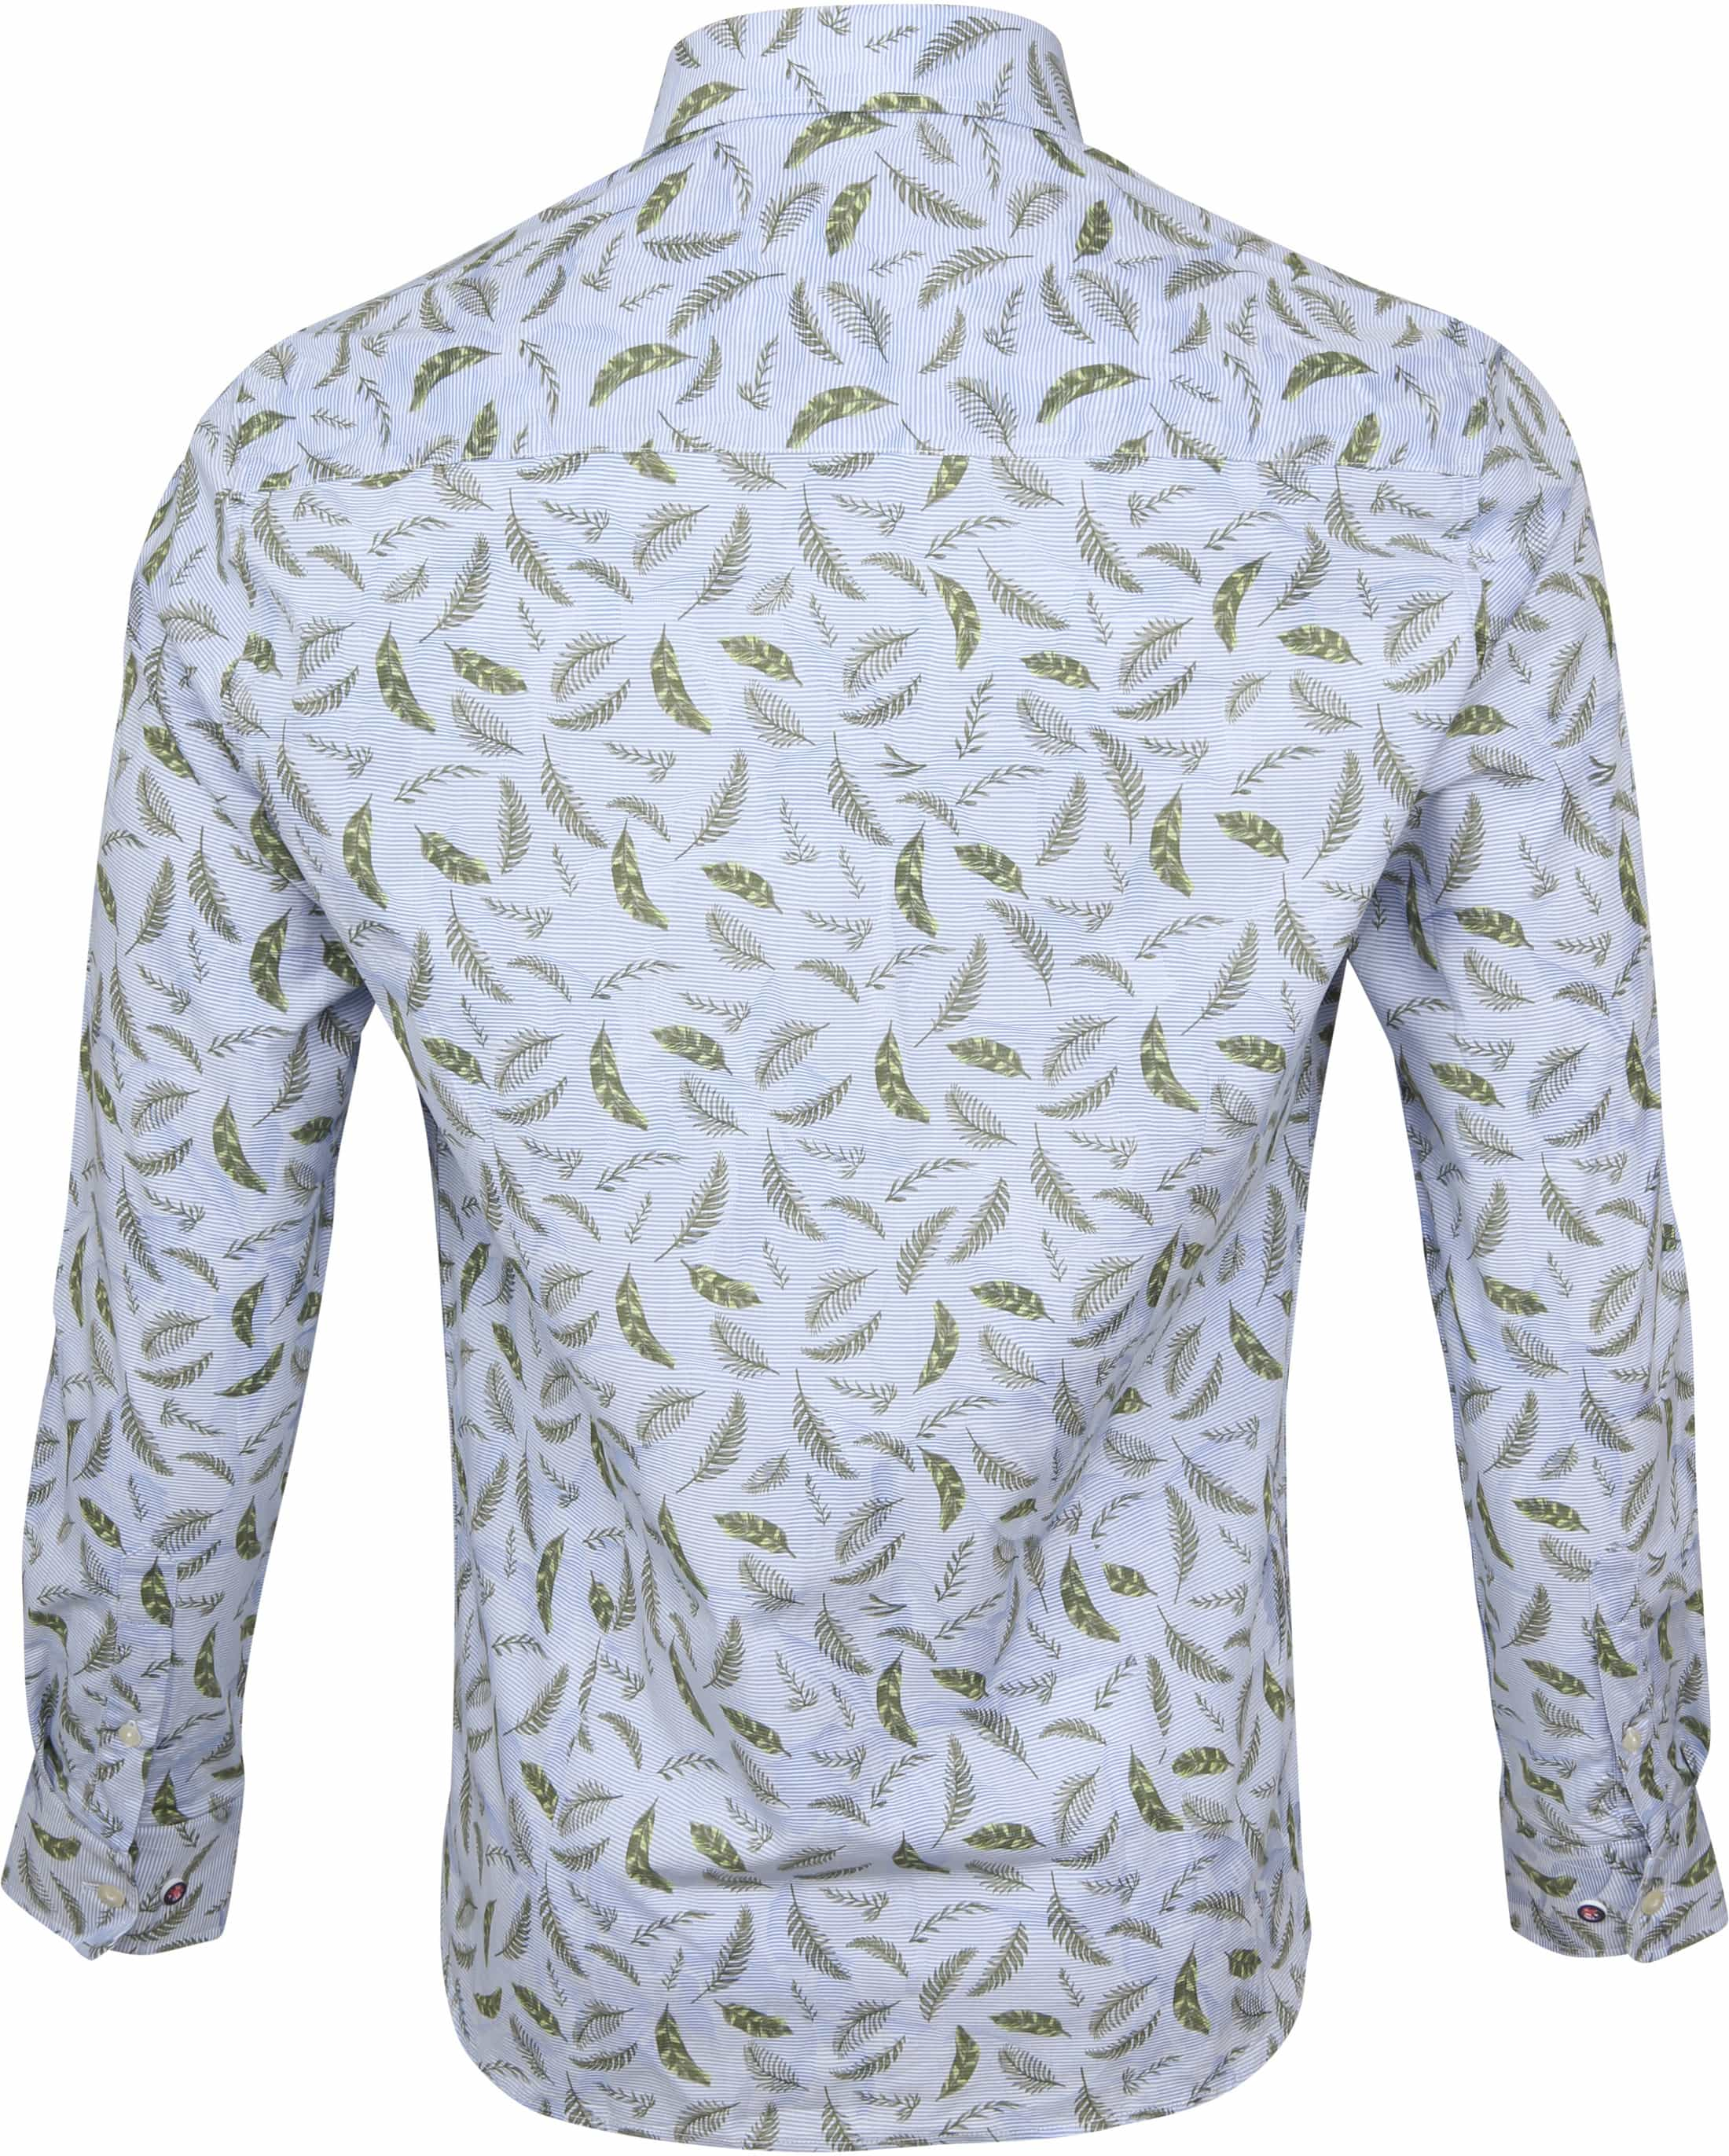 NZA Overhemd Hauroko  foto 3